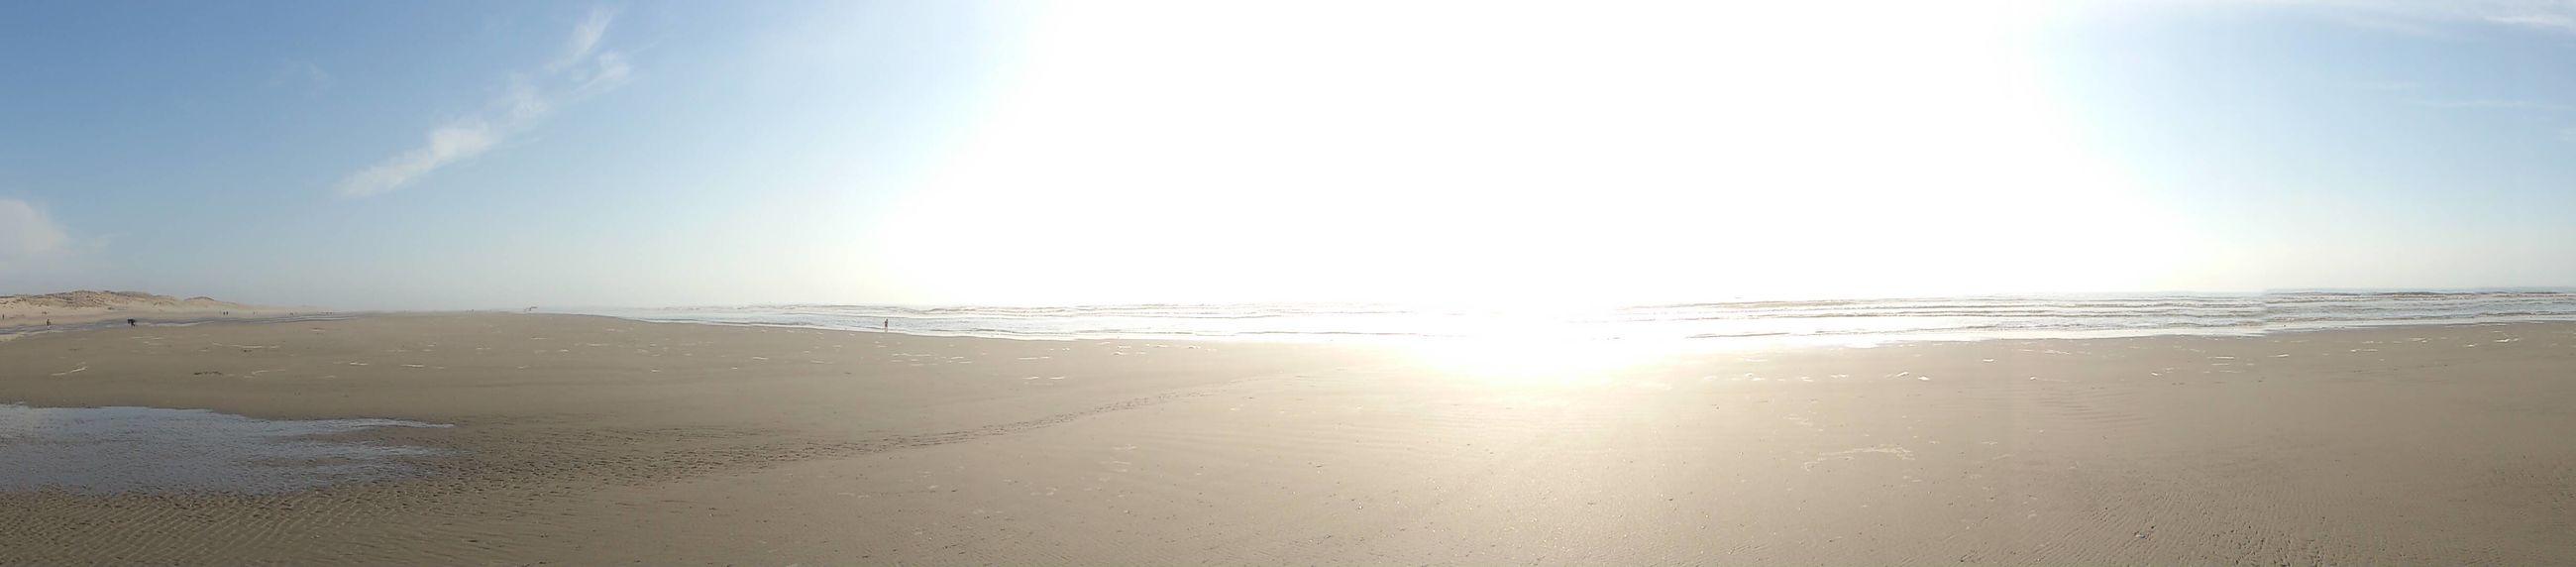 sun, beach, sea, water, tranquil scene, scenics, tranquility, sunlight, sunbeam, horizon over water, beauty in nature, sand, sky, shore, nature, lens flare, idyllic, sunny, reflection, outdoors